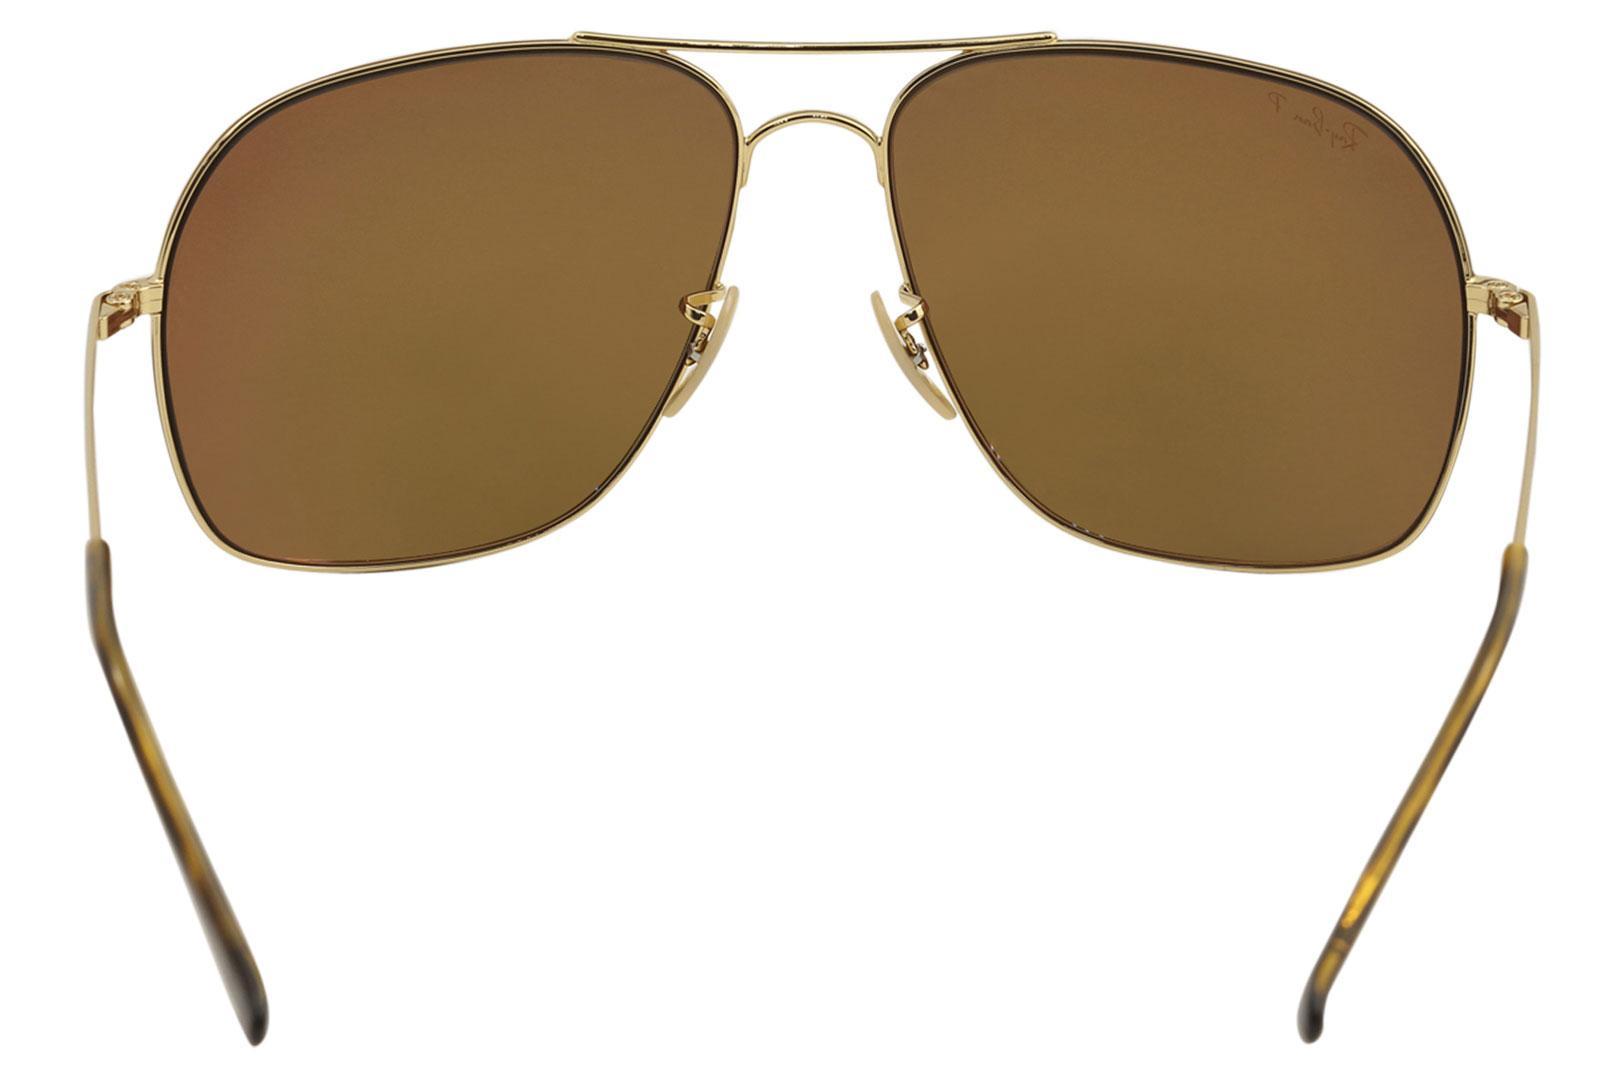 eb27b22c21f Ray Ban Men s RB3587CH RB 3587 CH Fashion Pilot RayBan Sunglasses by Ray Ban.  12345